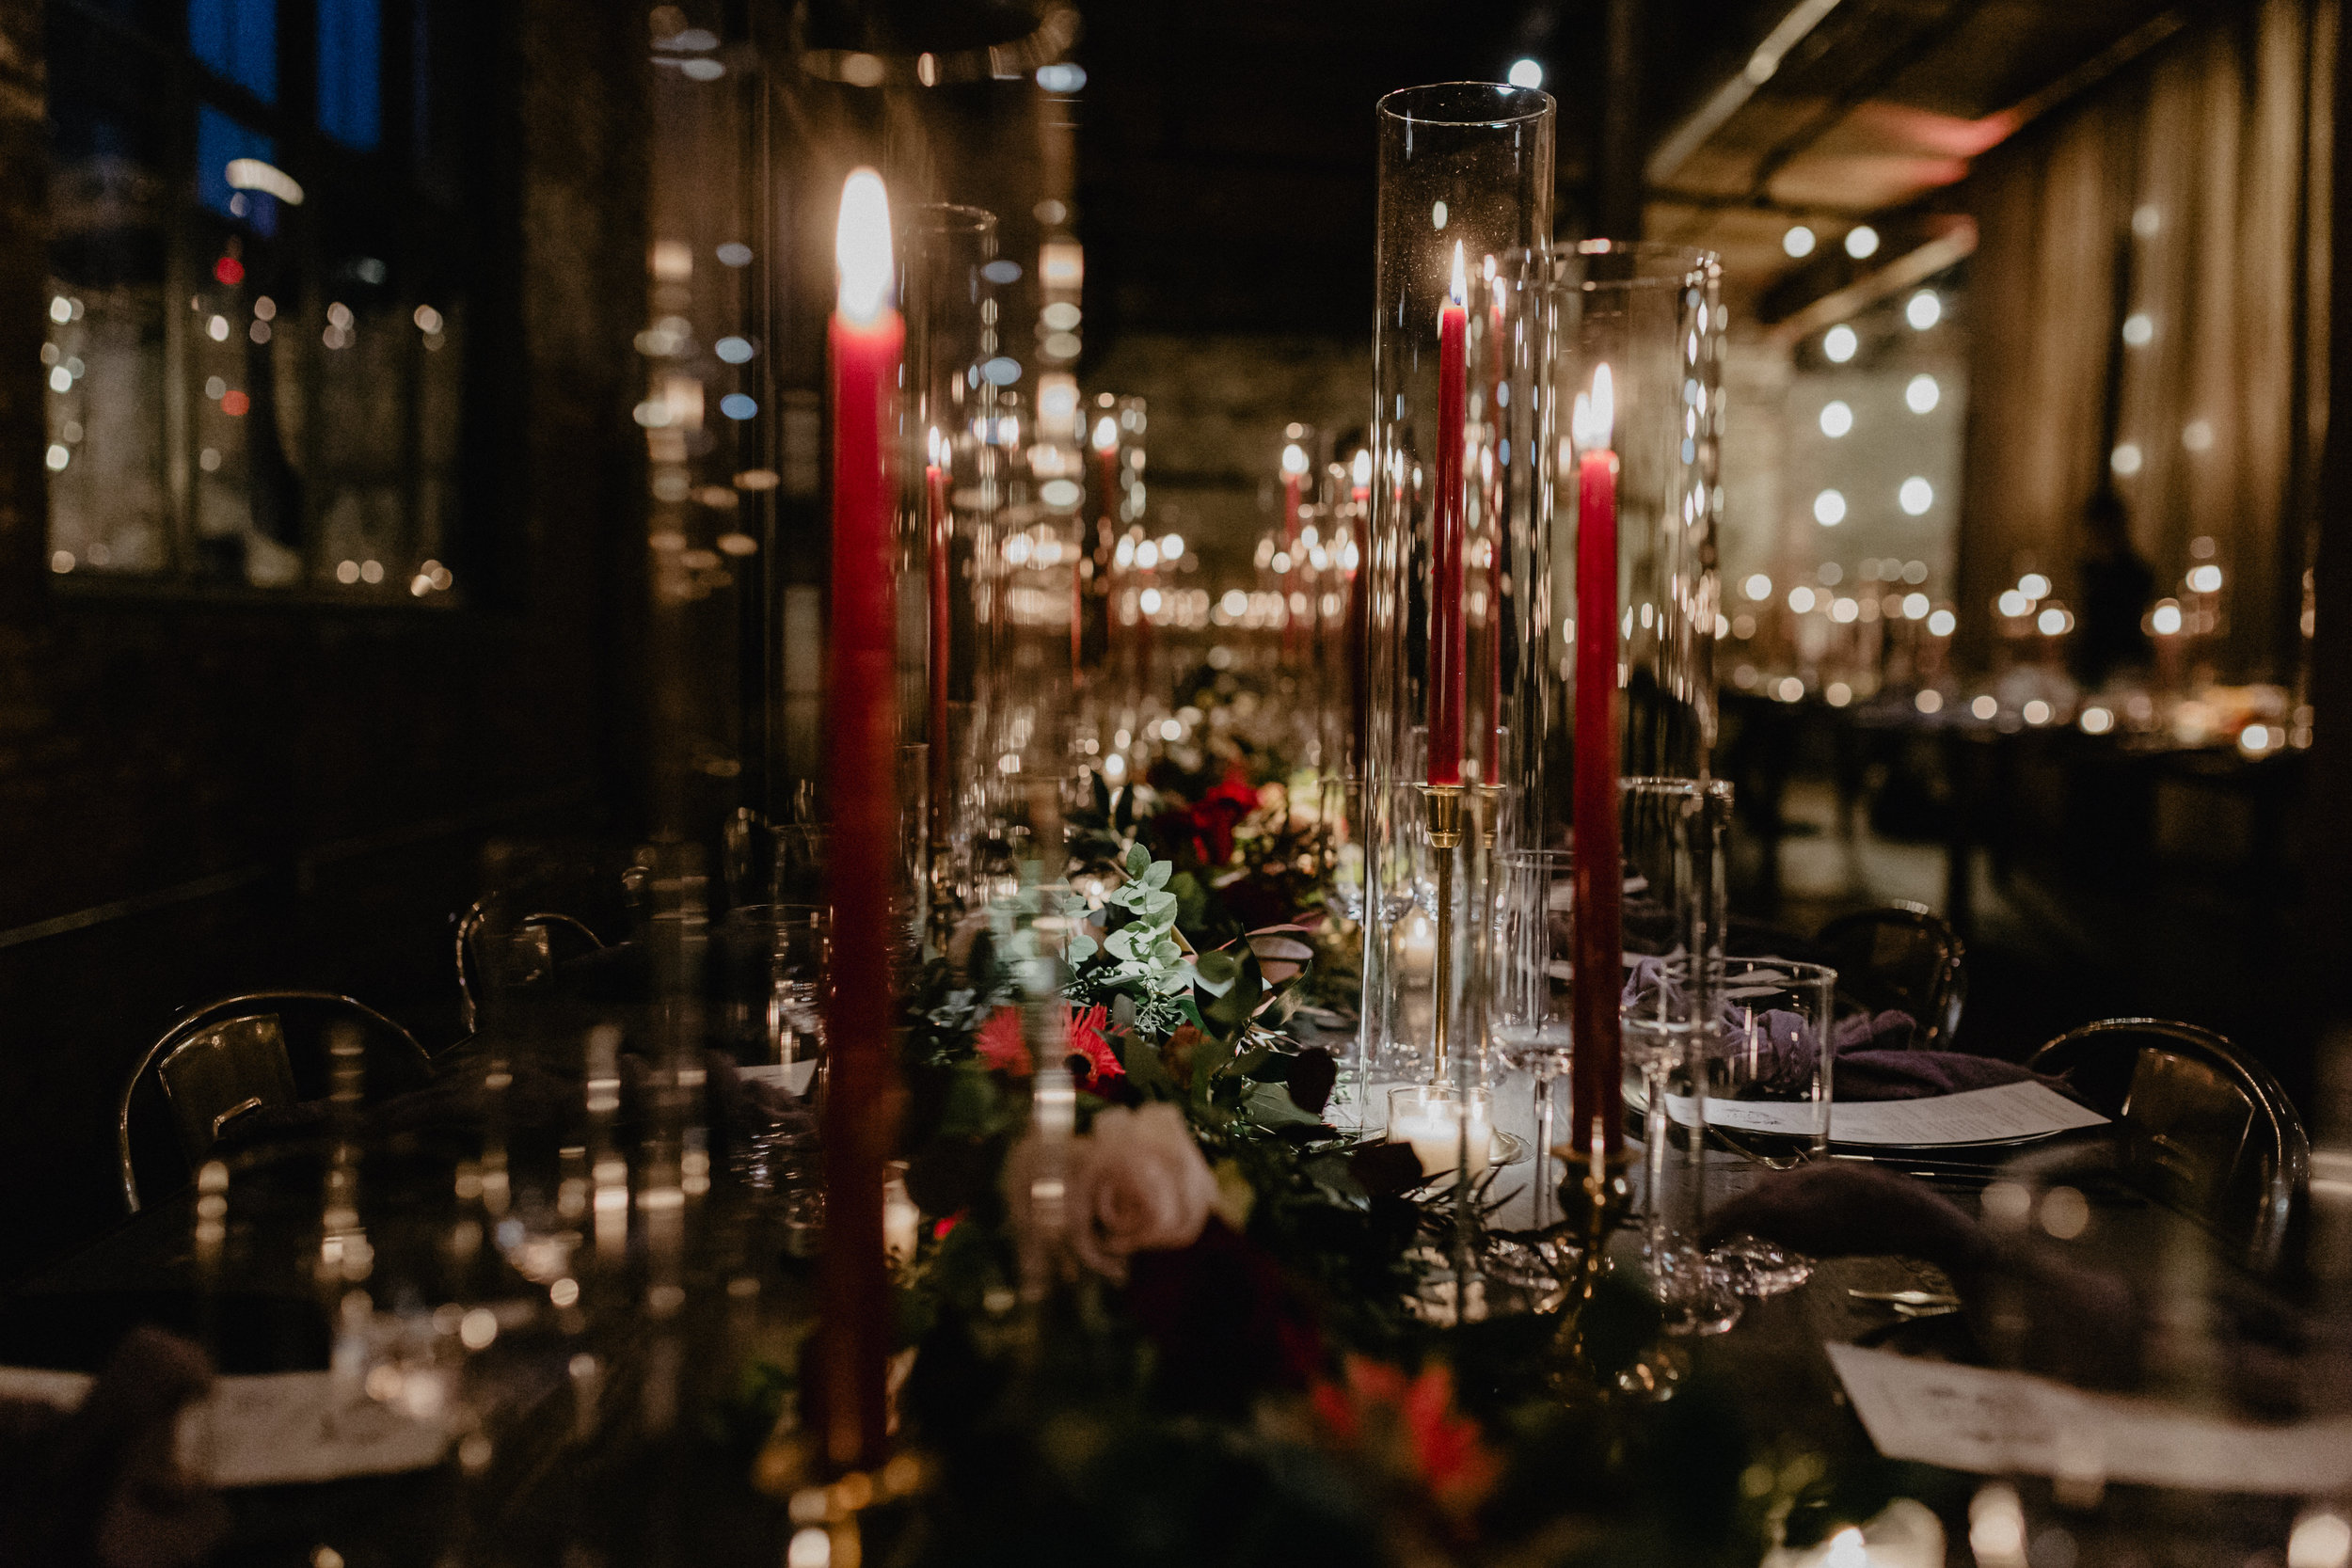 greenpoint_loft_wedding_081.jpg